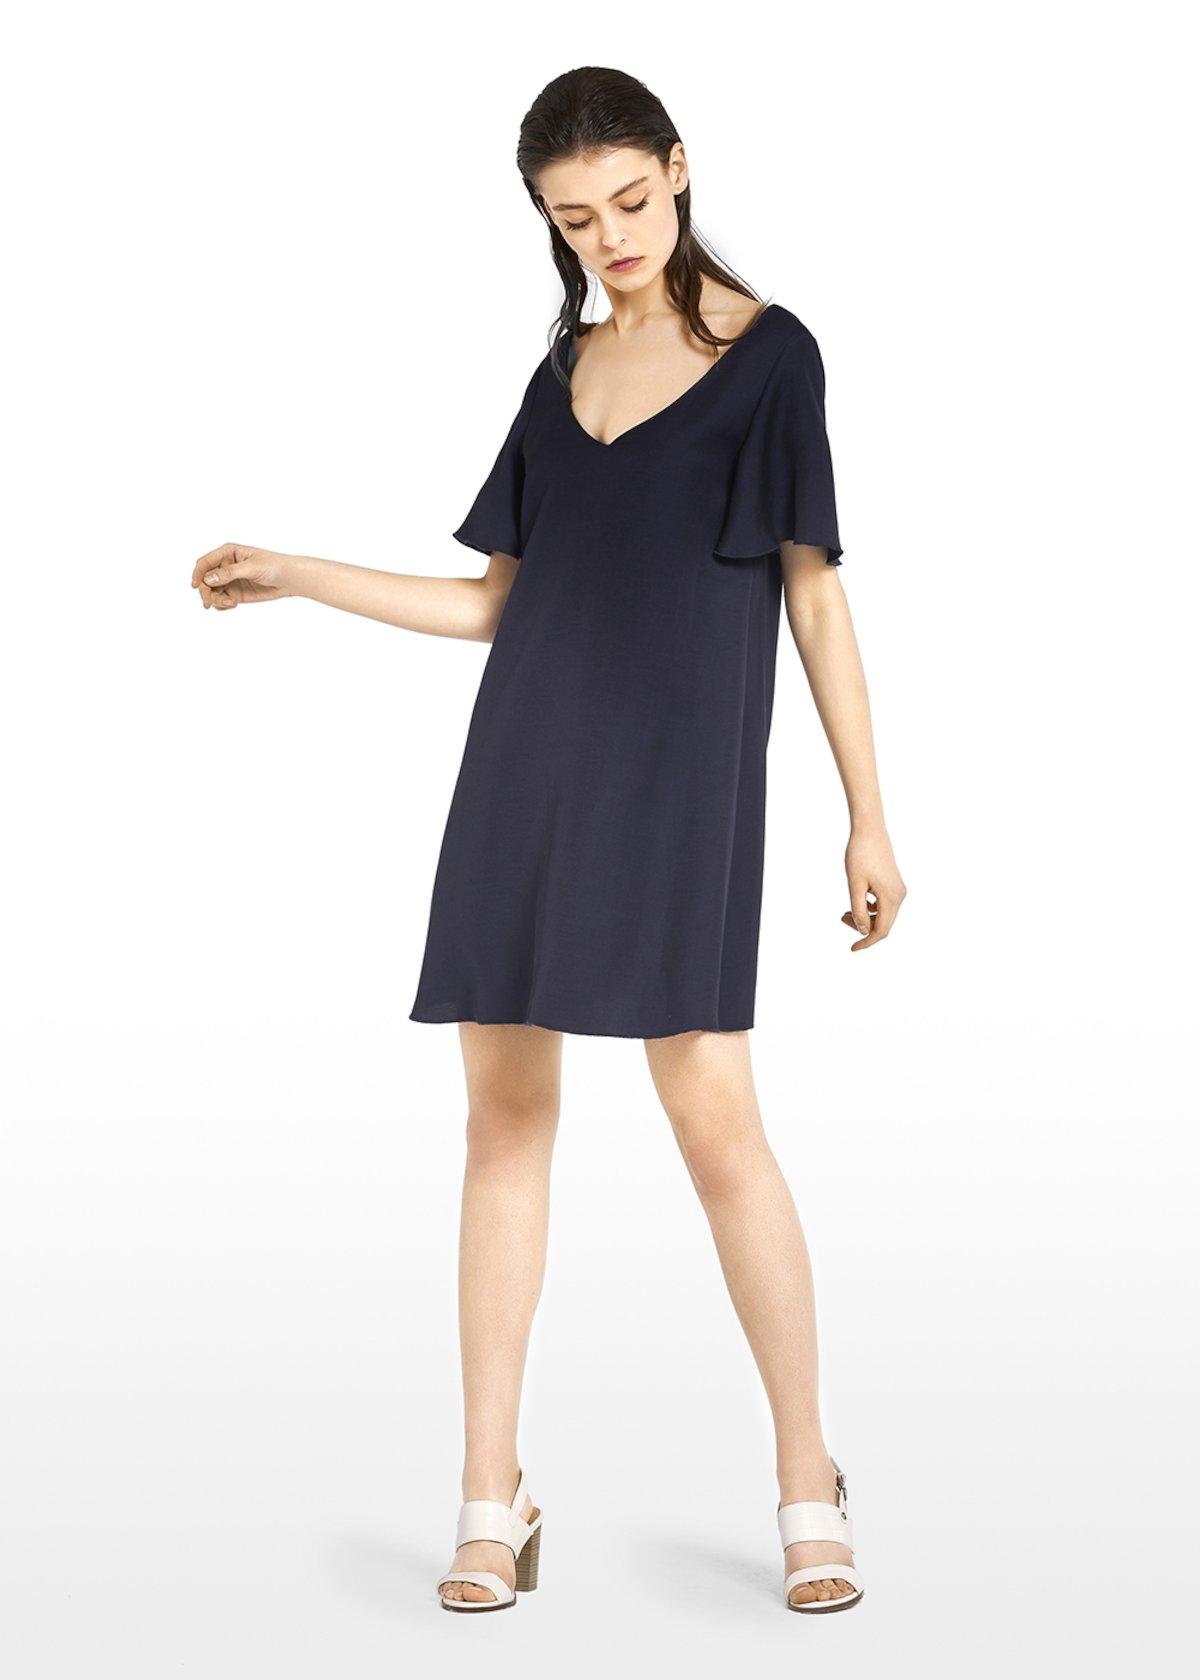 Agadir dress in linen blend with ruffles at the cuffs - Medium Blue - Woman - Category image